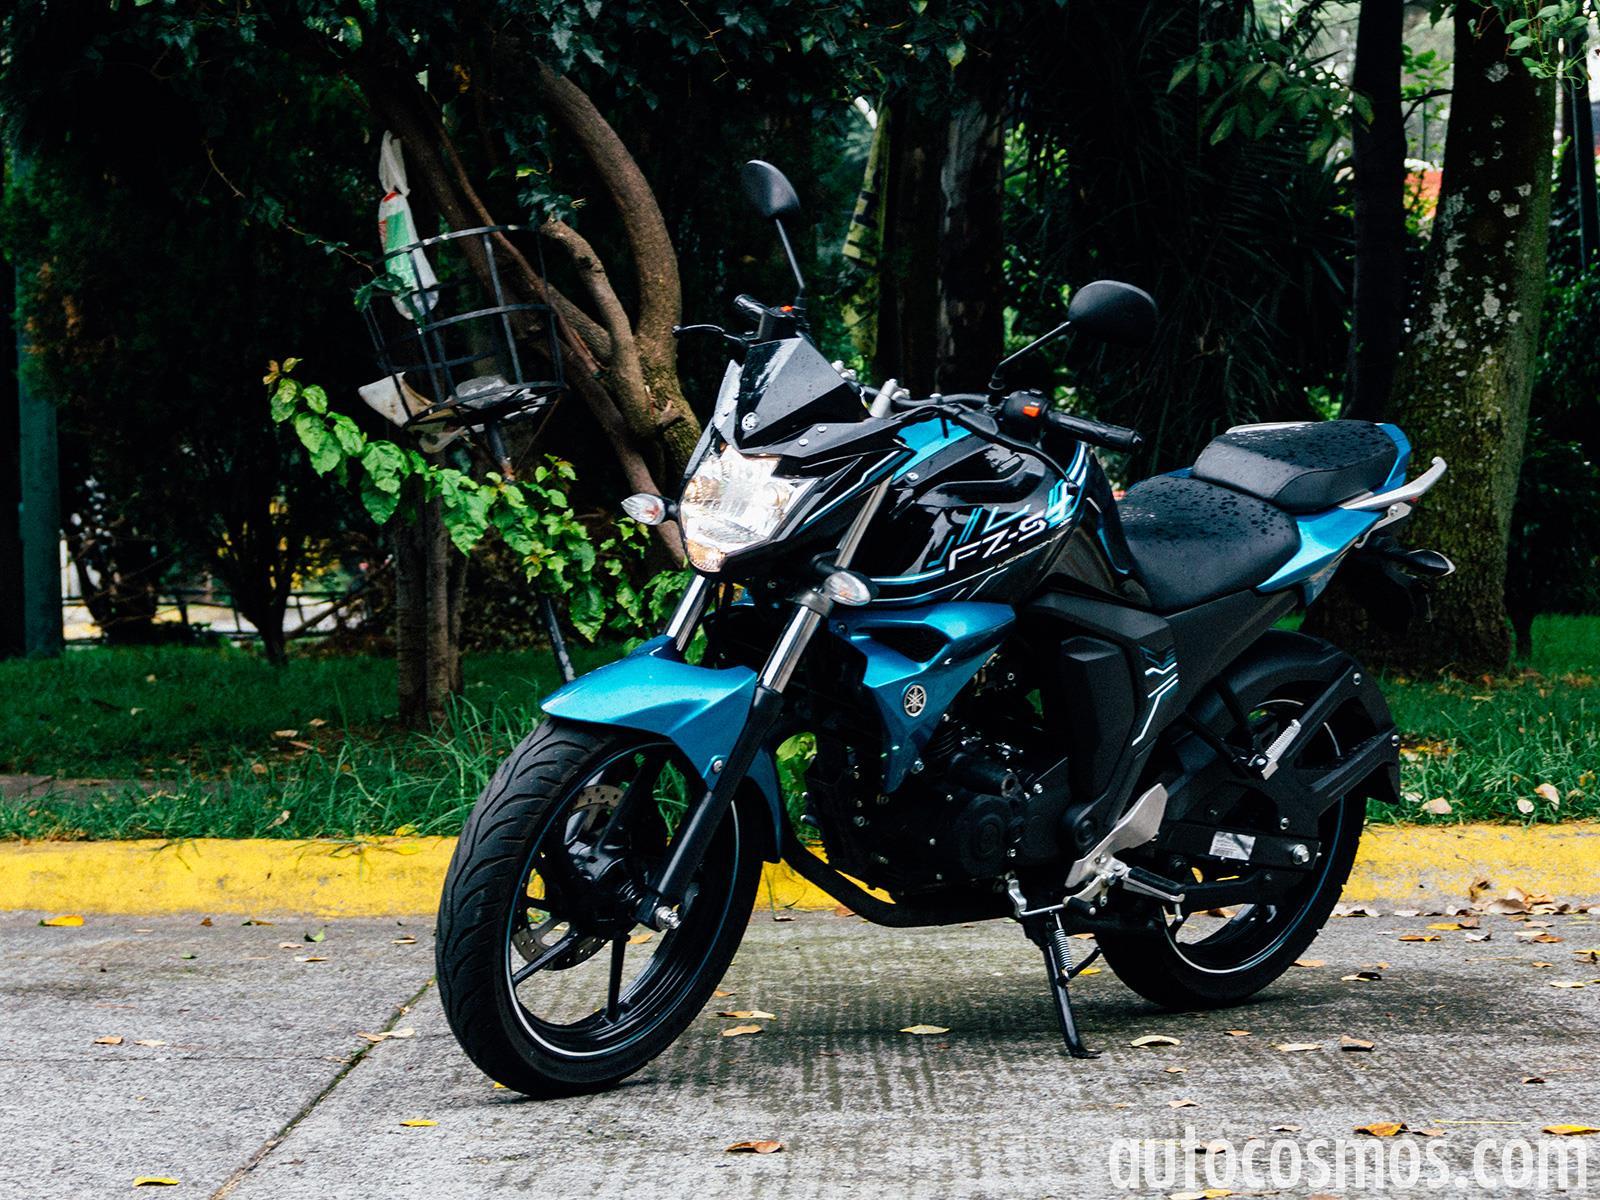 Fz Yamaha Precio Mexico